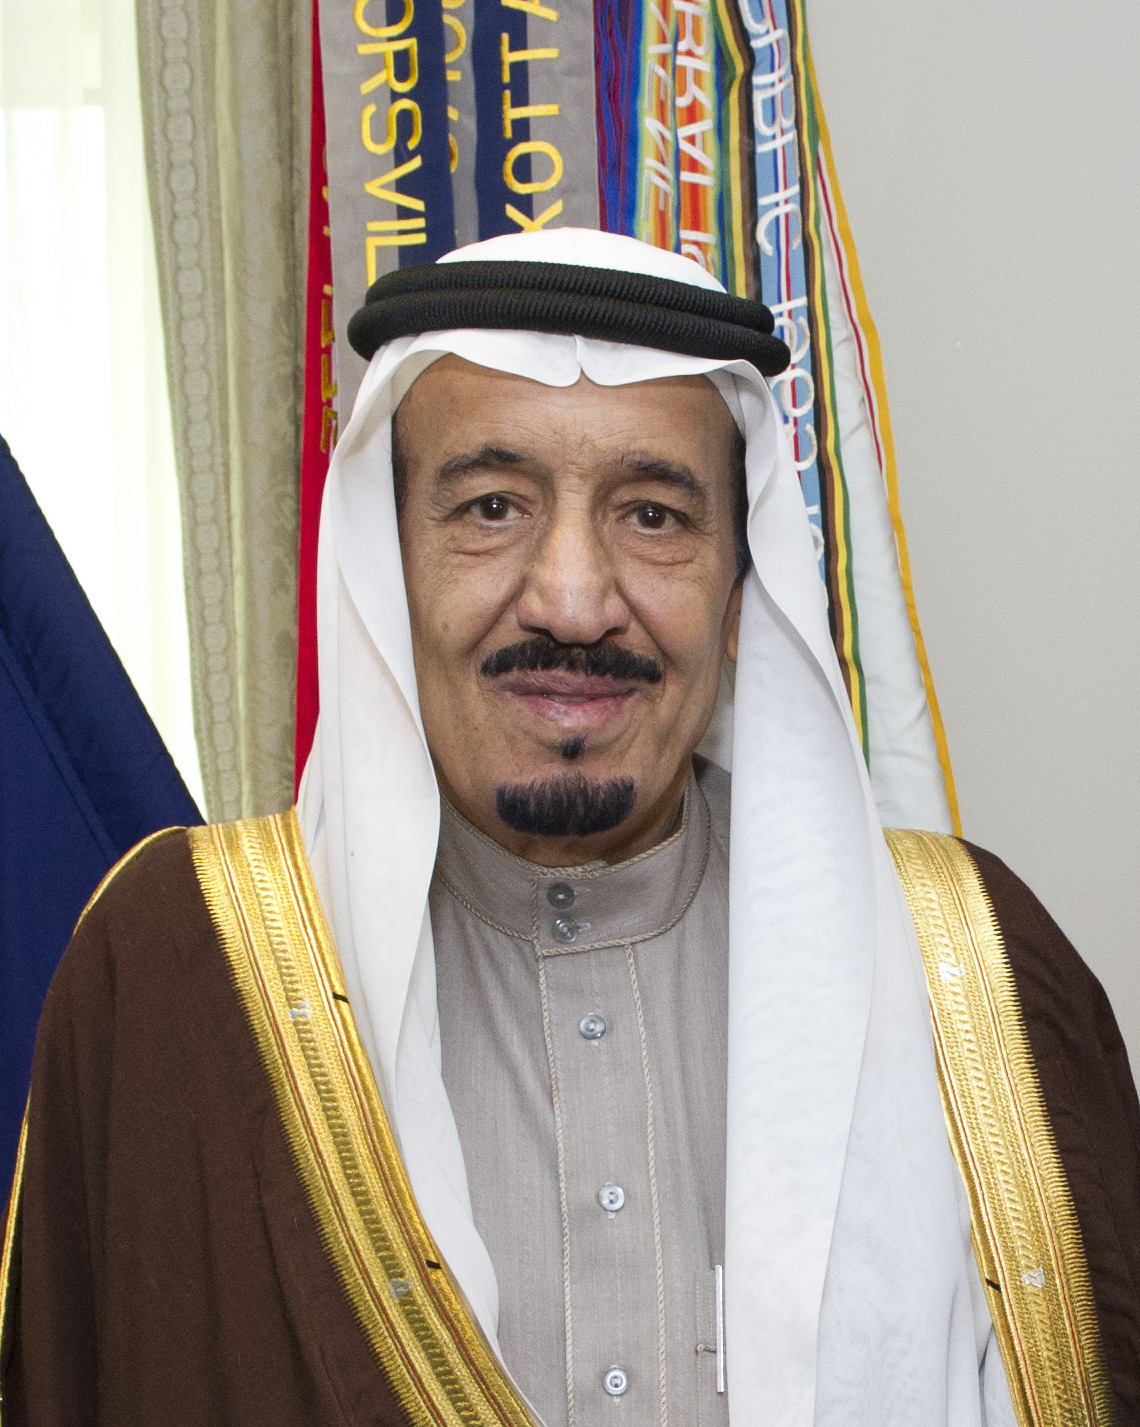 middle east - Cultural history of Saudi Arabian rulers ...